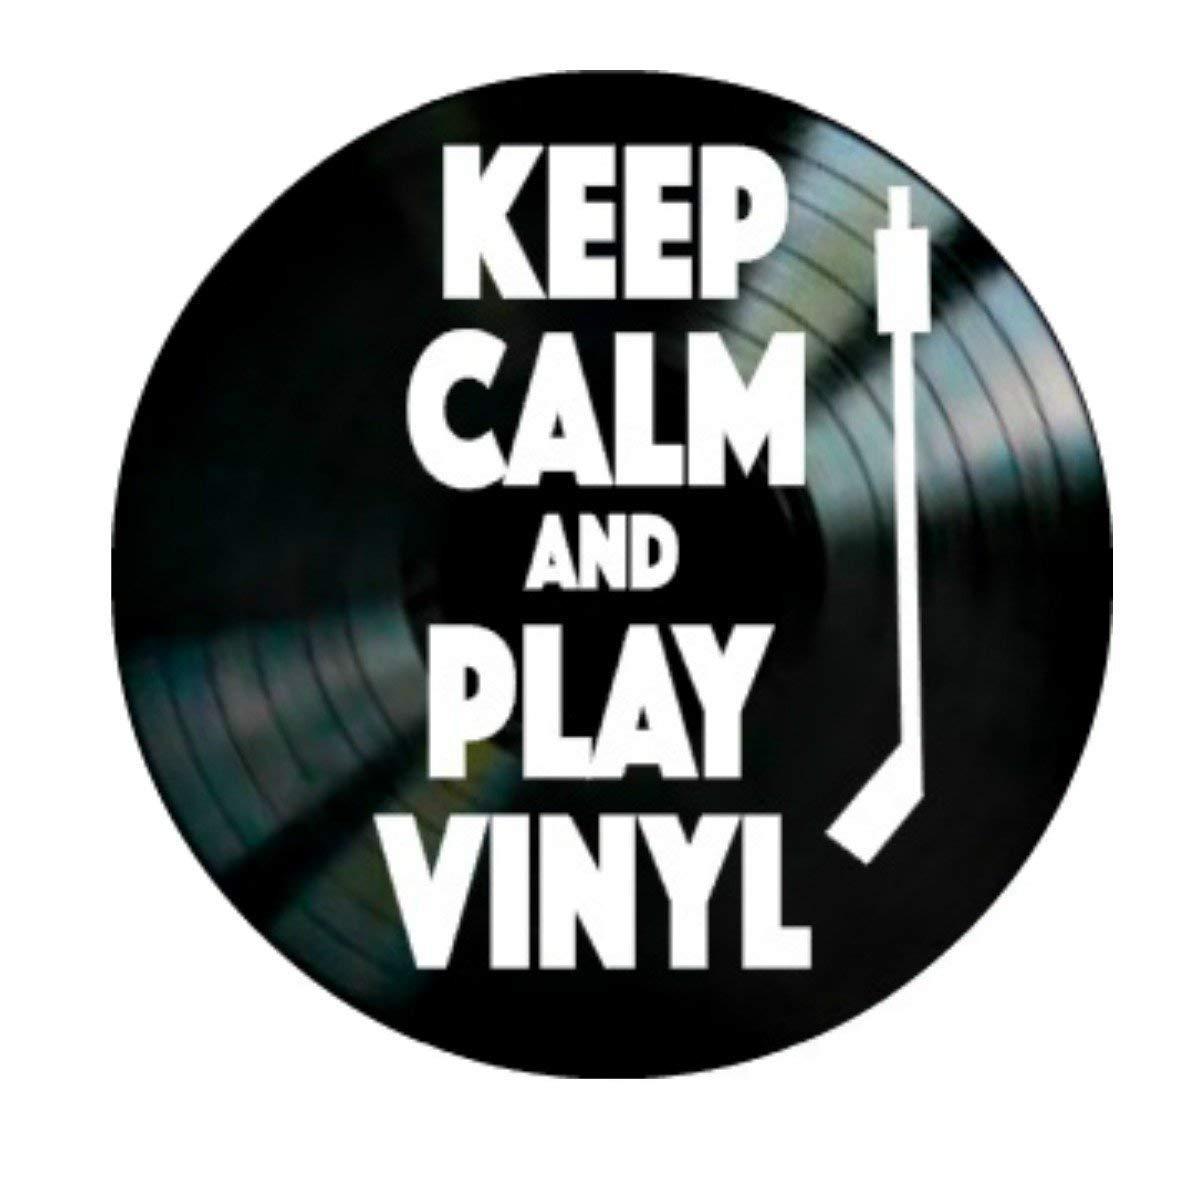 Keep Calm and Play Vinyl Record Album Wall Art Home Decor Gift